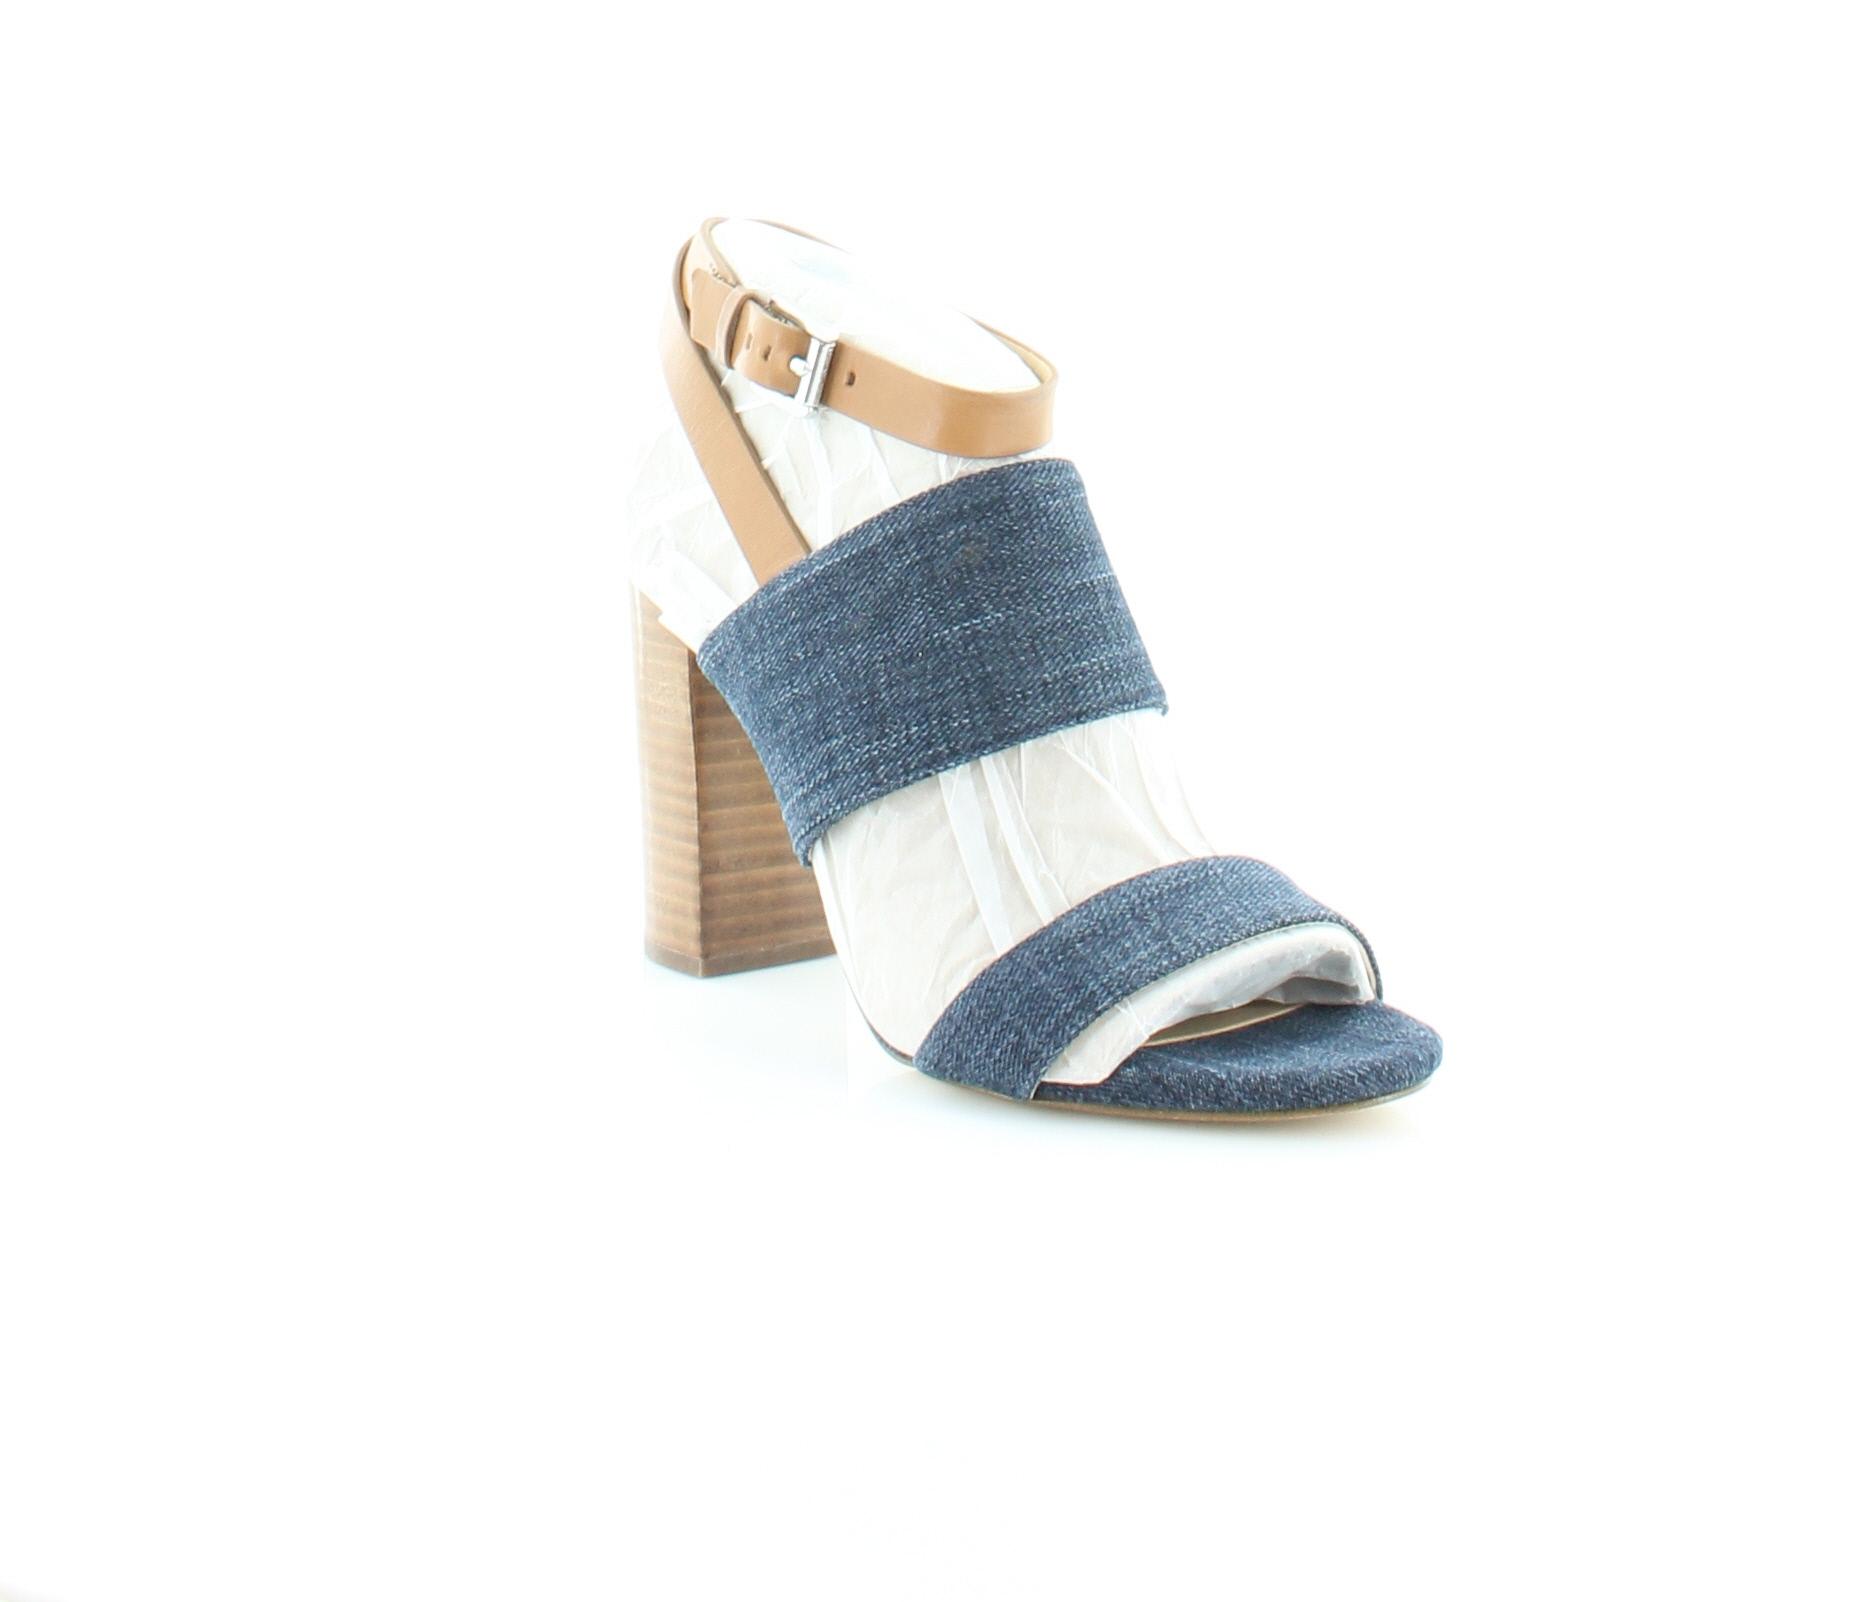 Michael Kors Arden Sandal Women's Sandals & Flip Flops Indigo/Acorn Size 6 M